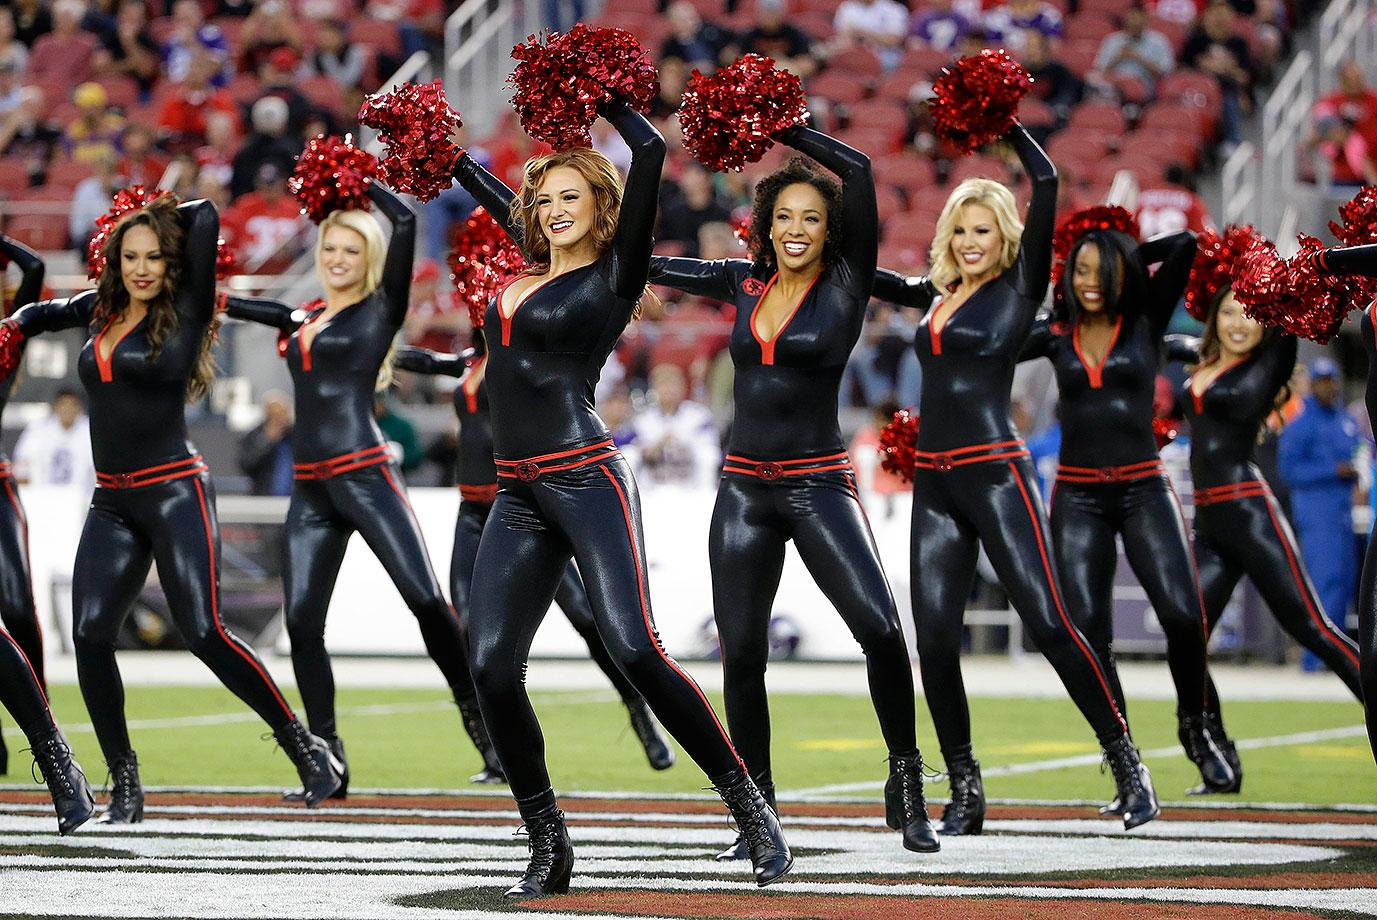 Cheer Heaven Did You See The 49ers Cheerleaders Uniforms